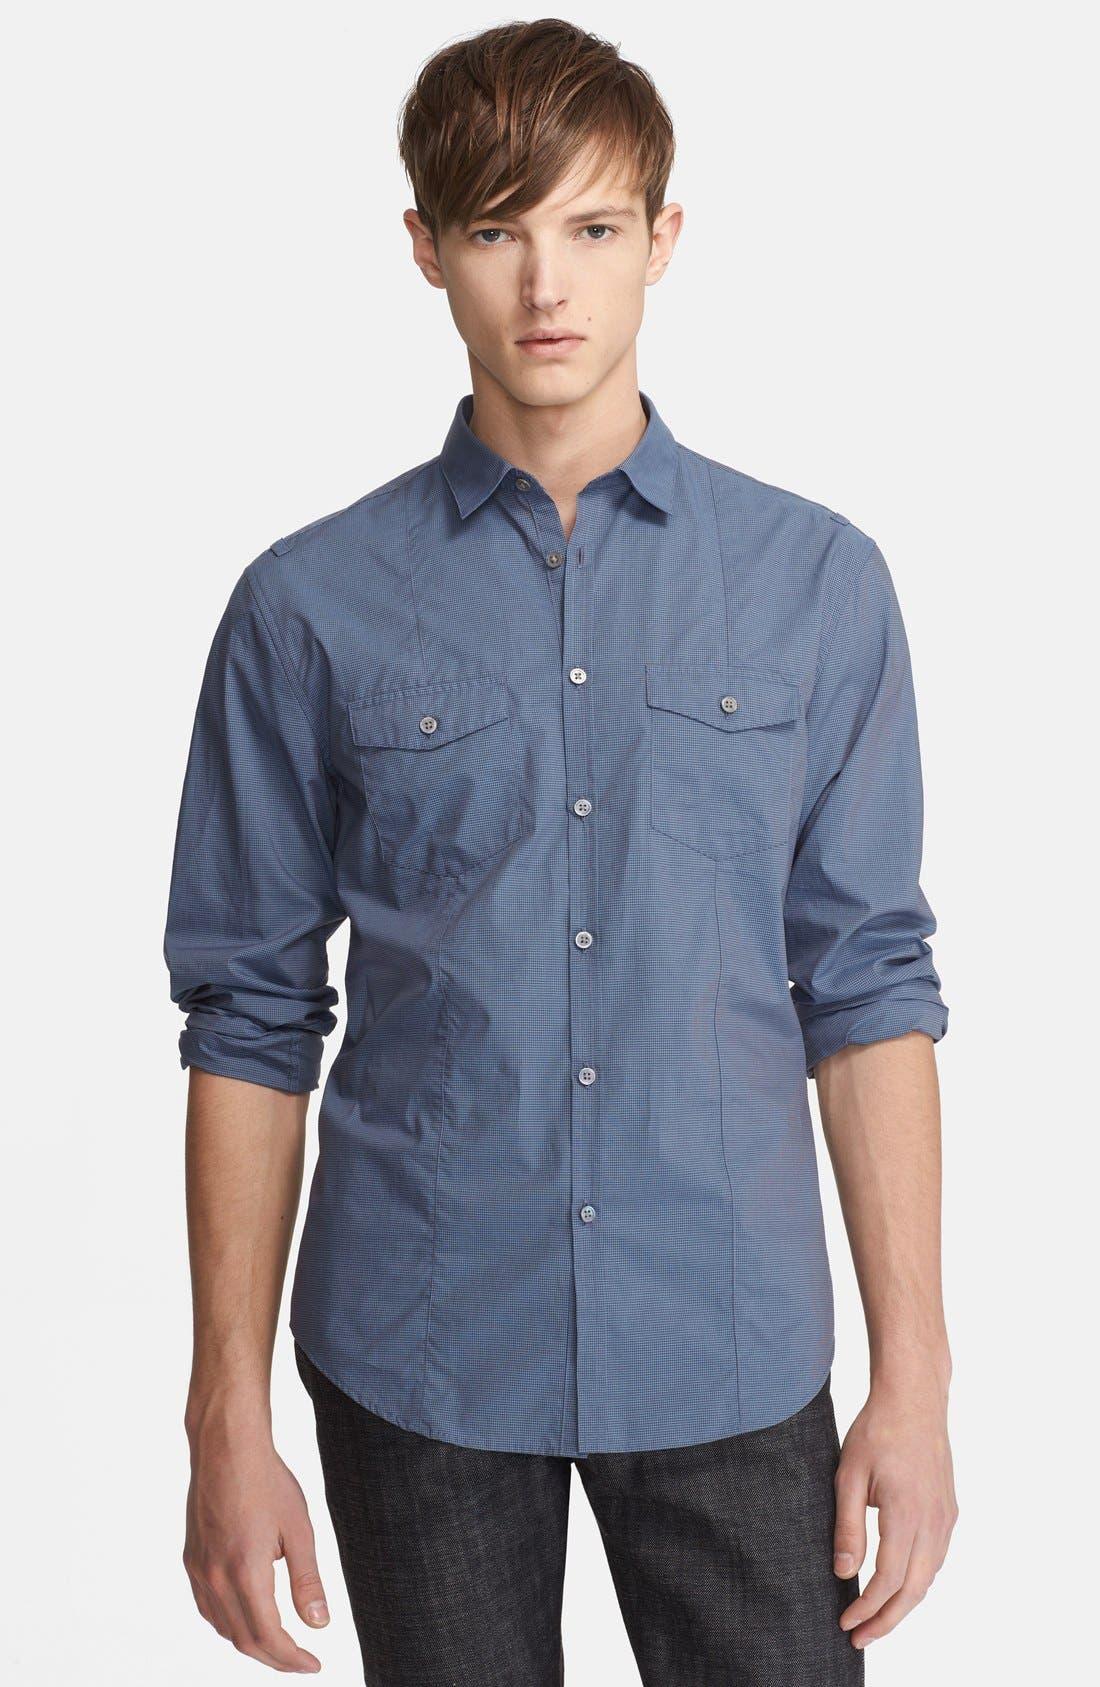 Alternate Image 1 Selected - John Varvatos Collection Slim Fit Check Cotton Shirt